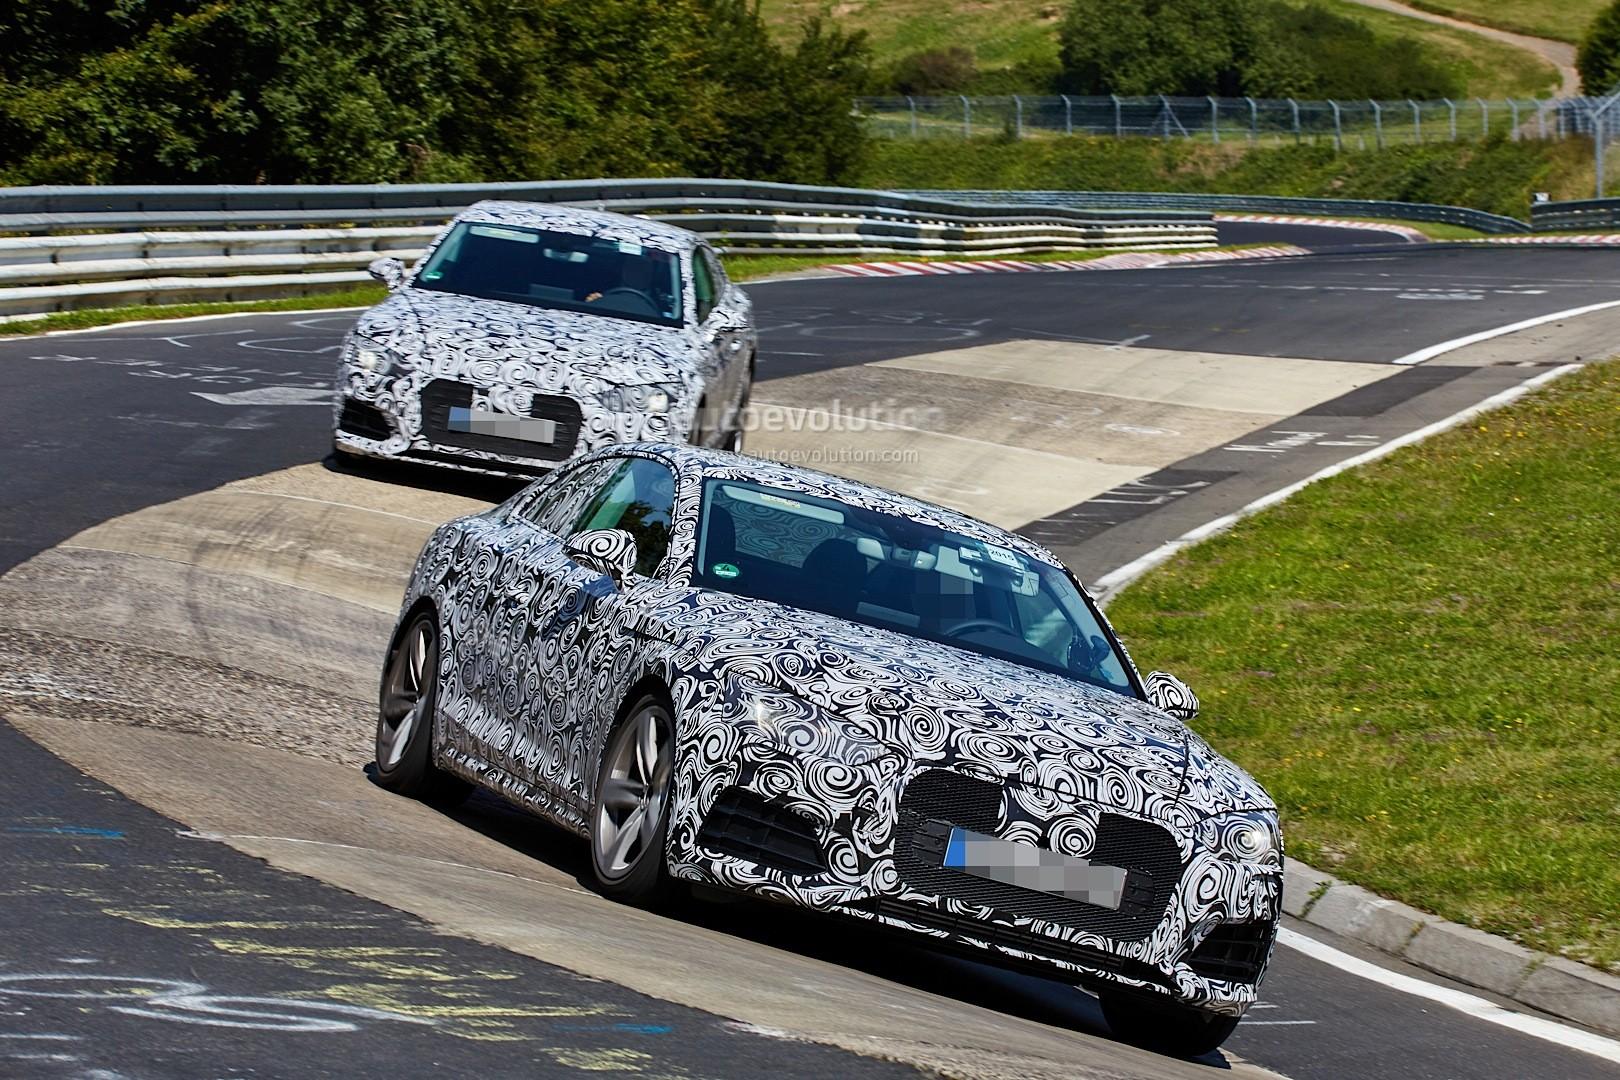 Spyshots: 2017 Audi A5 / S5 Interior Revealed - autoevolution